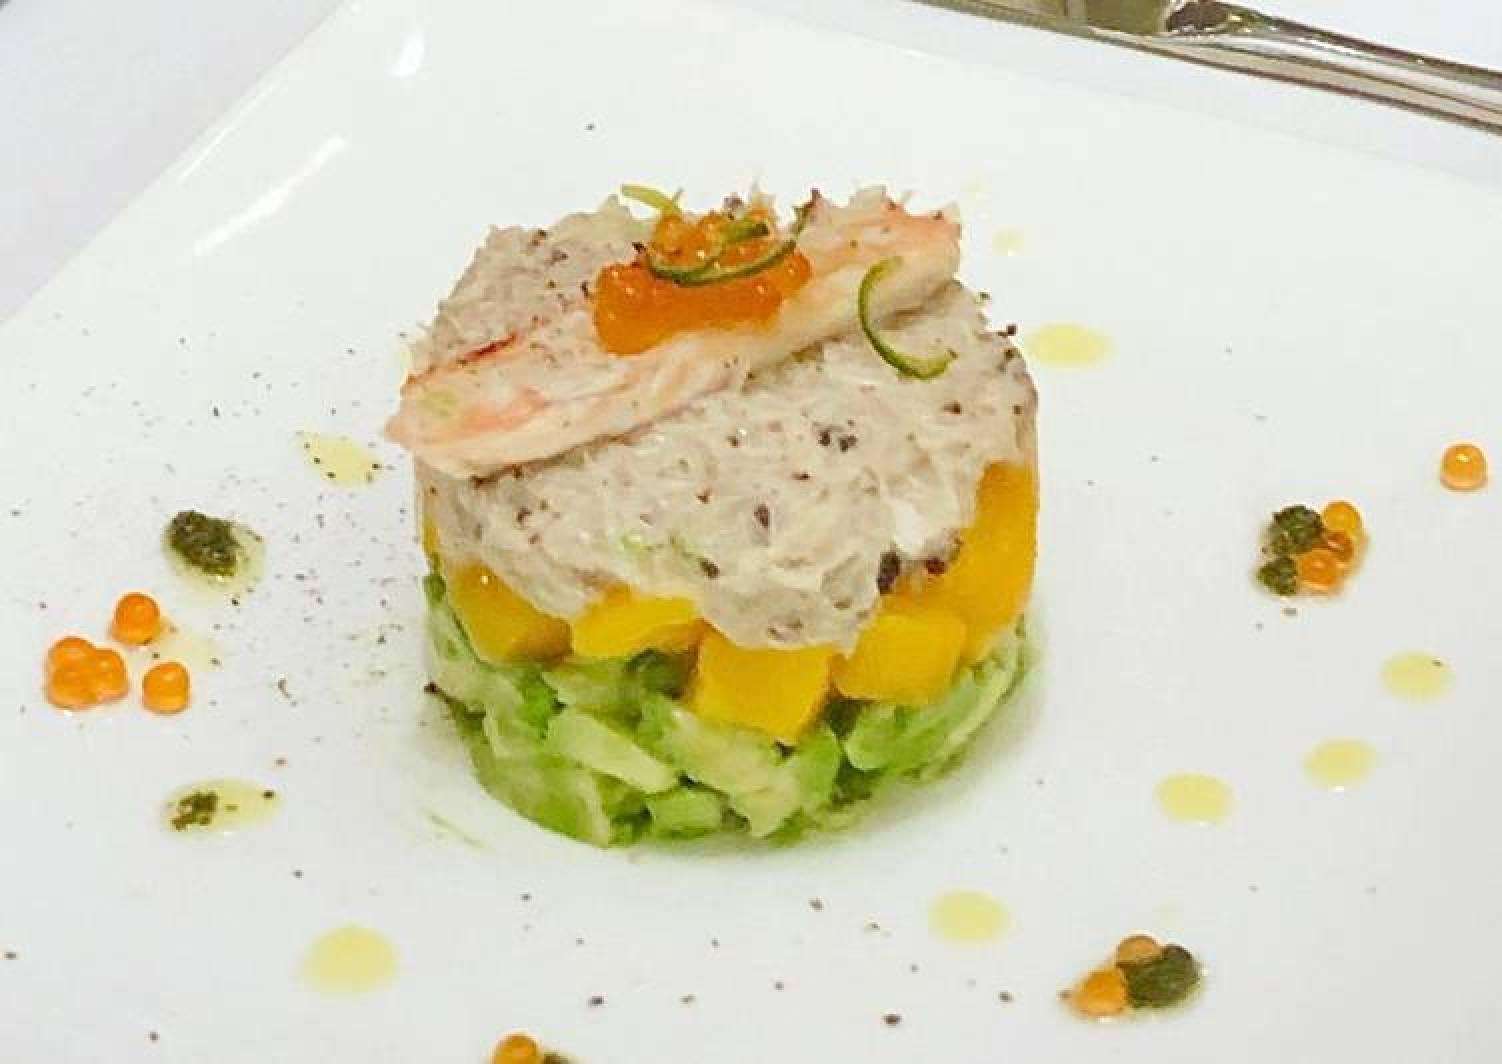 Crabmeat truffle salad with Mango and Avocado